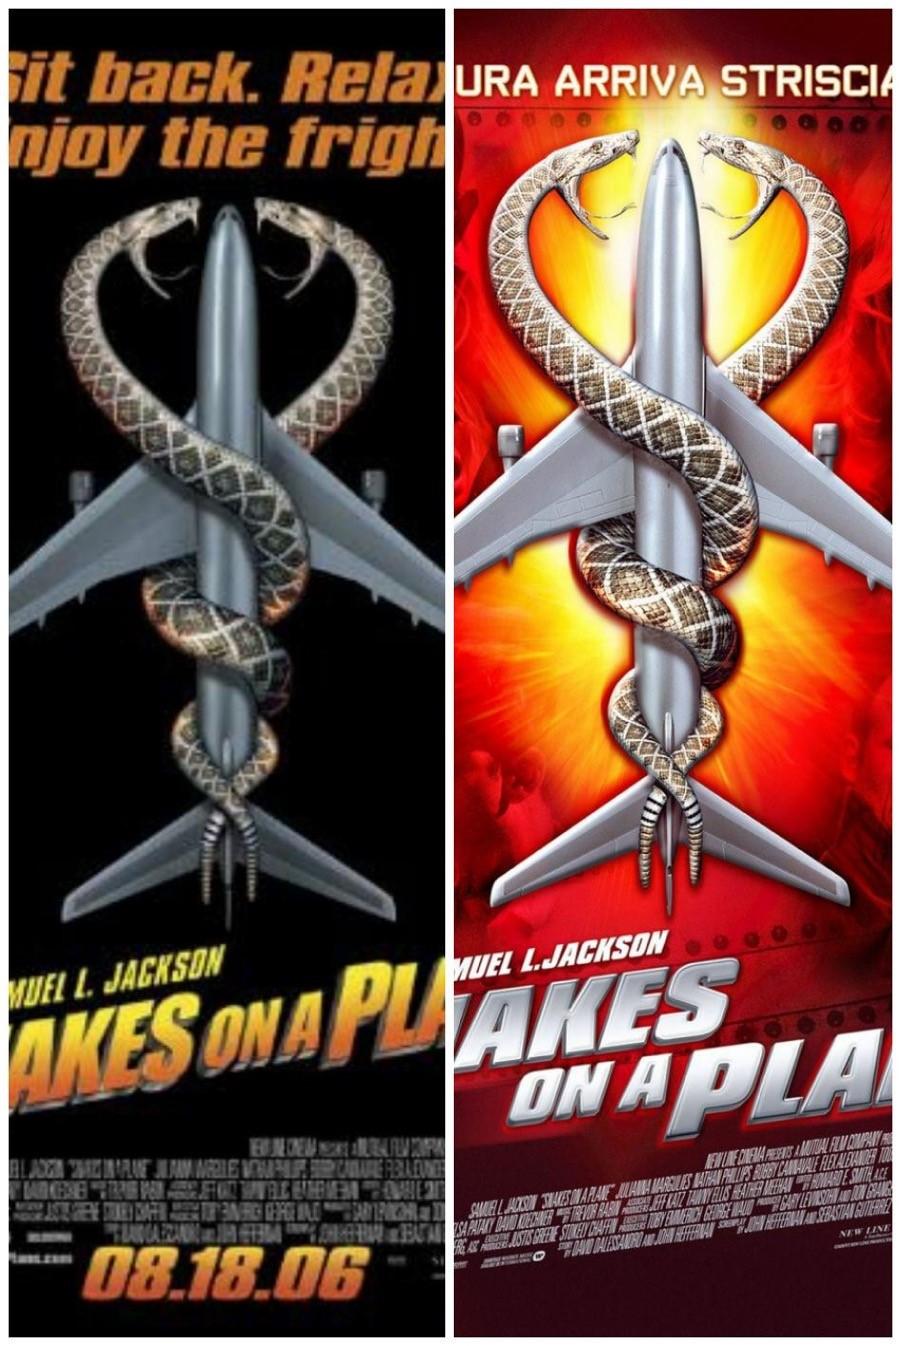 1- مار ها در هواپیما (Snakes on a Plane)